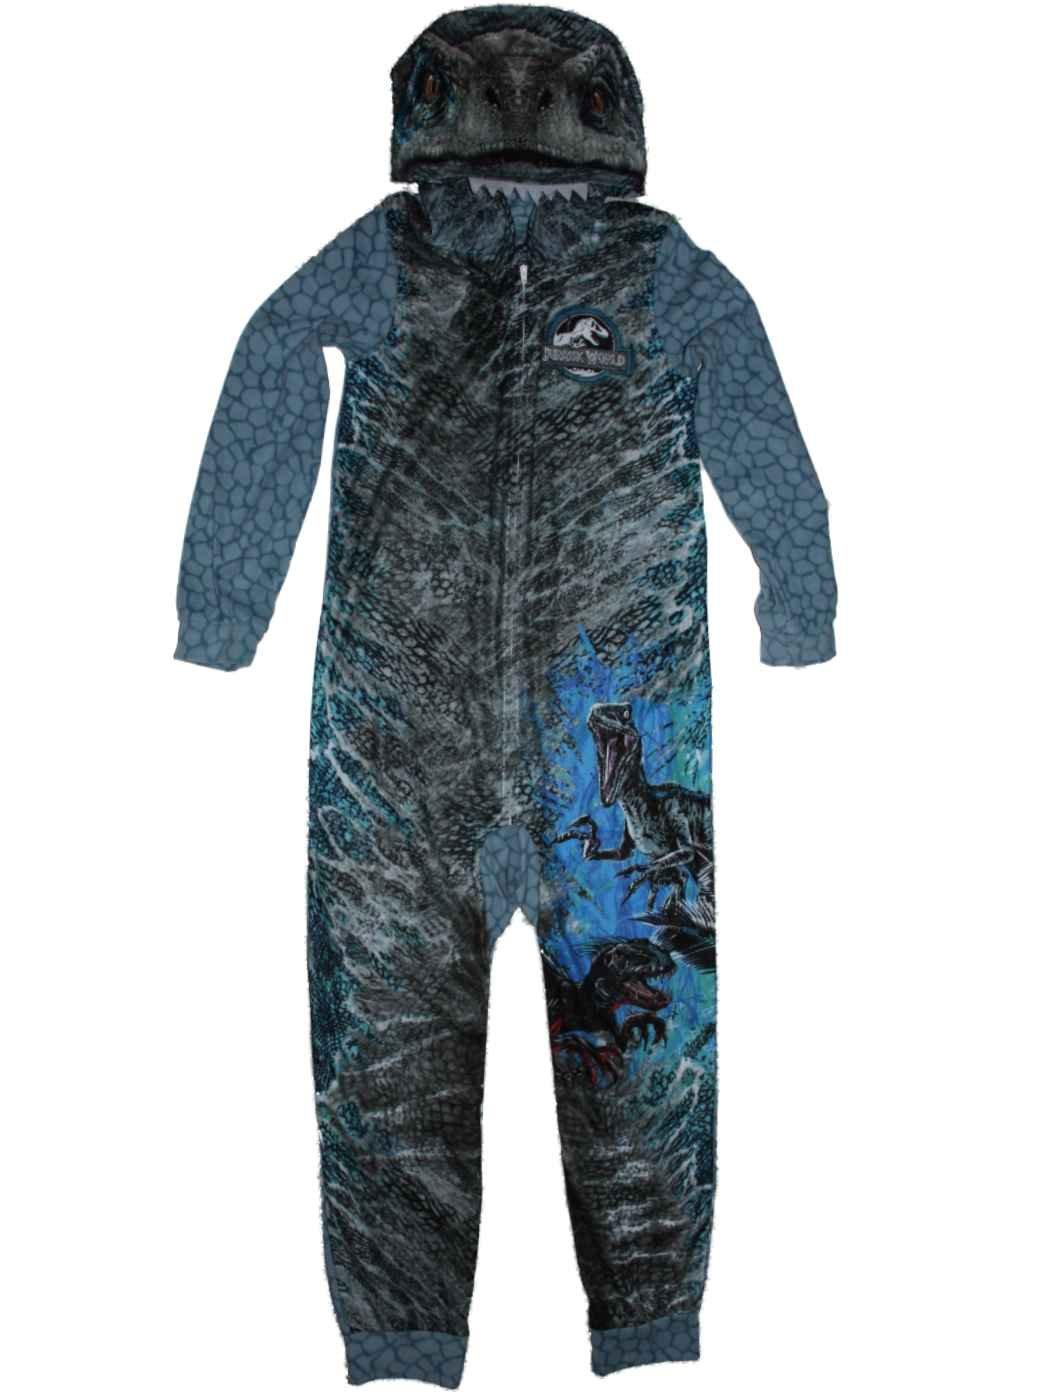 f49597a94f33 Ame jurassic world blue raptor fleece hooded union suit boys pajamas jpg  1050x1400 Home depot pajamas